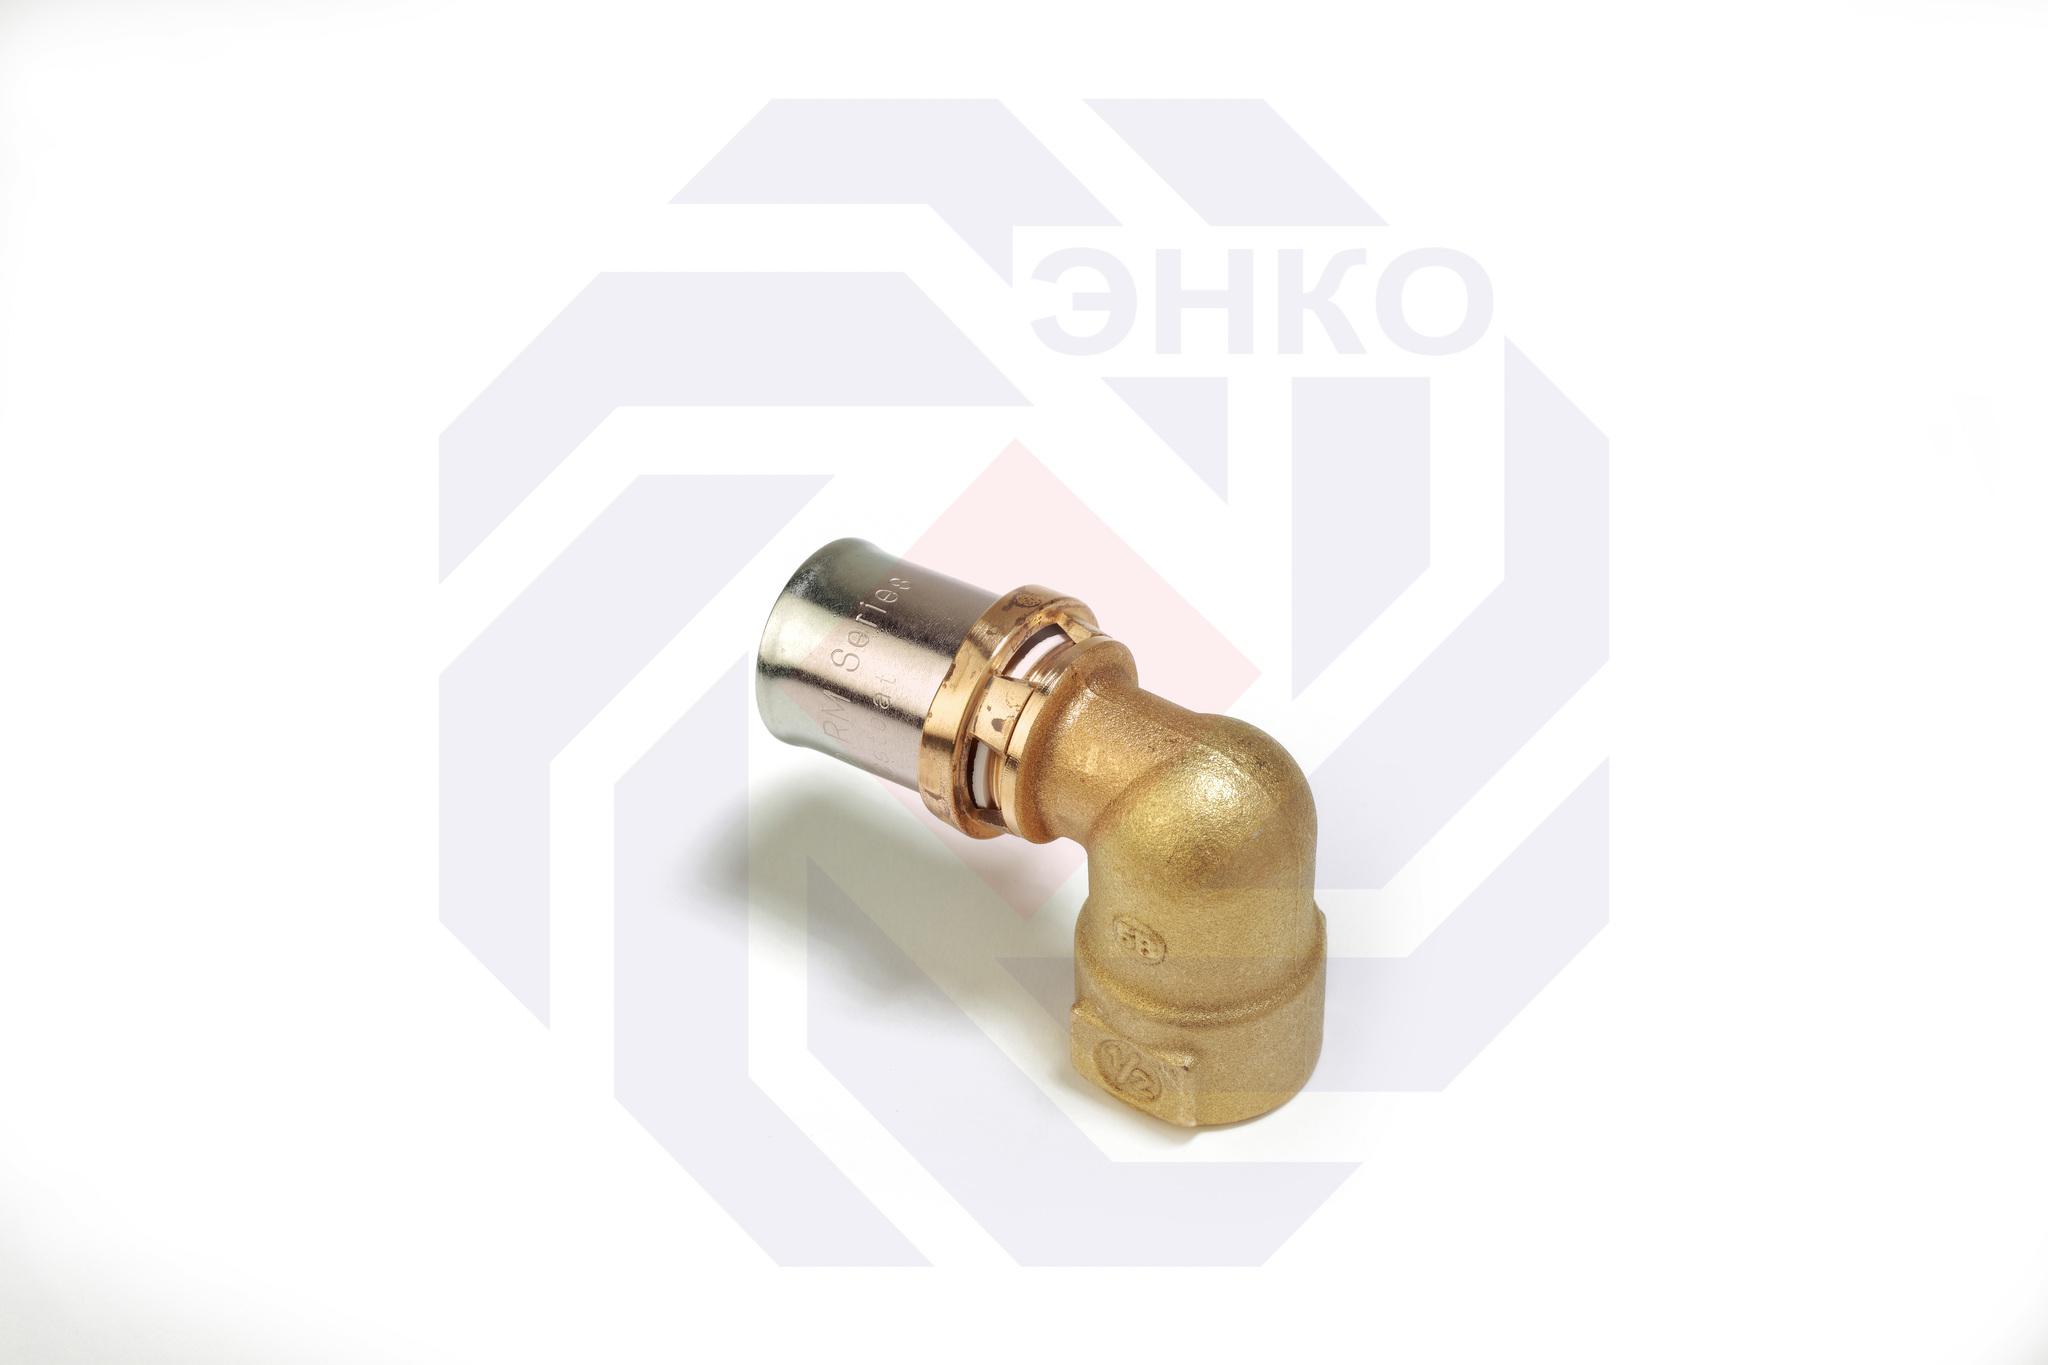 Пресс-фитинг отвод 90° ВР GIACOMINI RM 16⨯¾